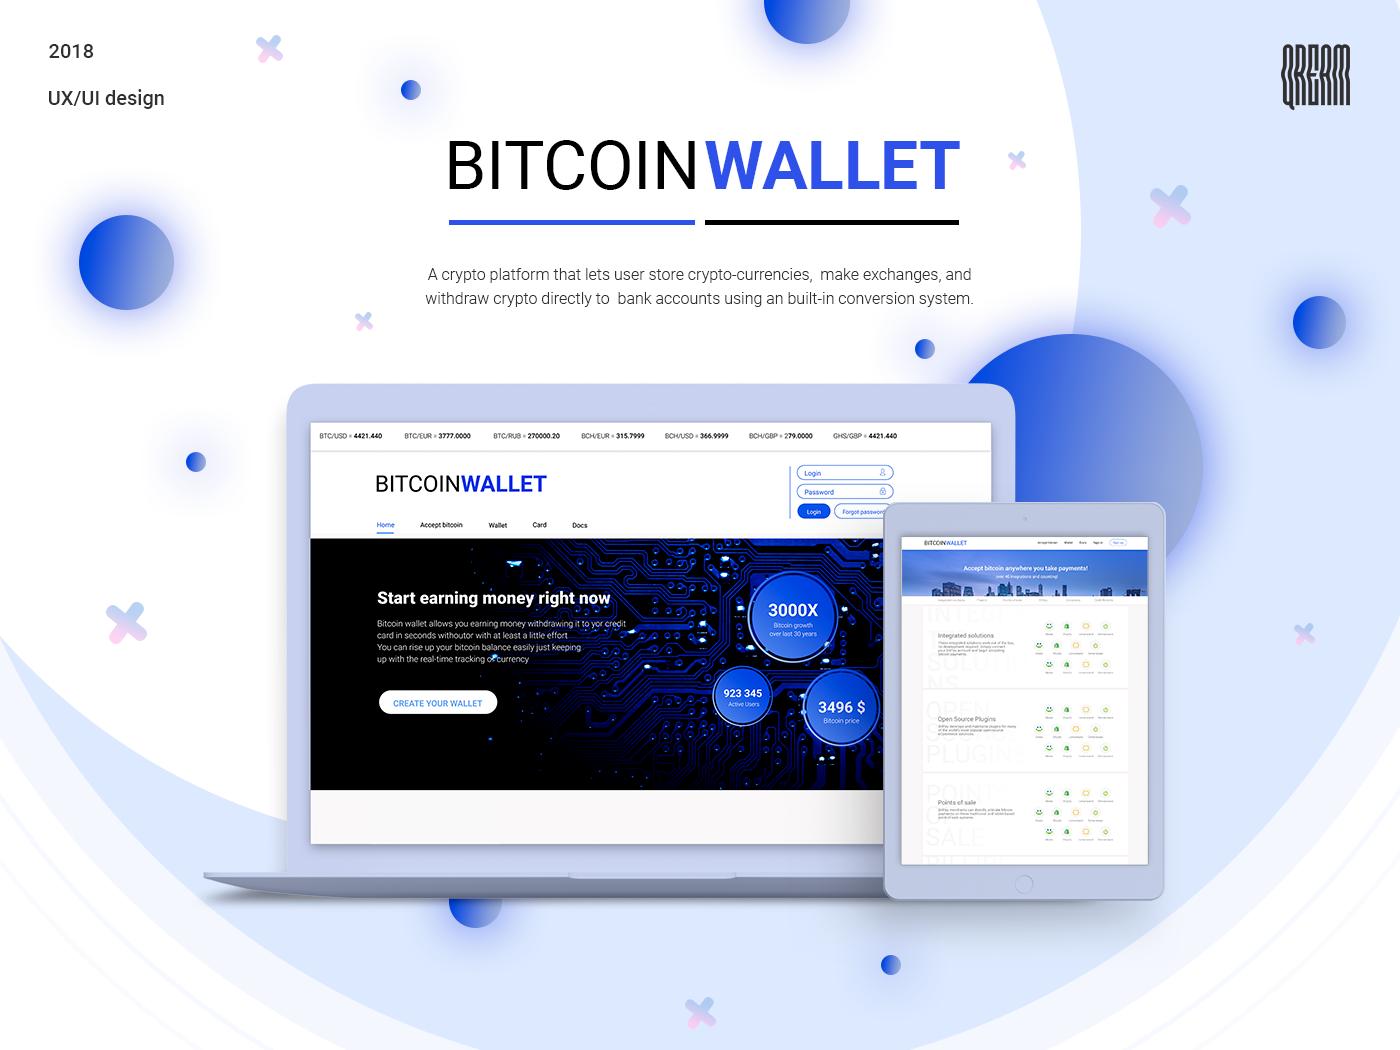 Online bitcoin wallet with exchange